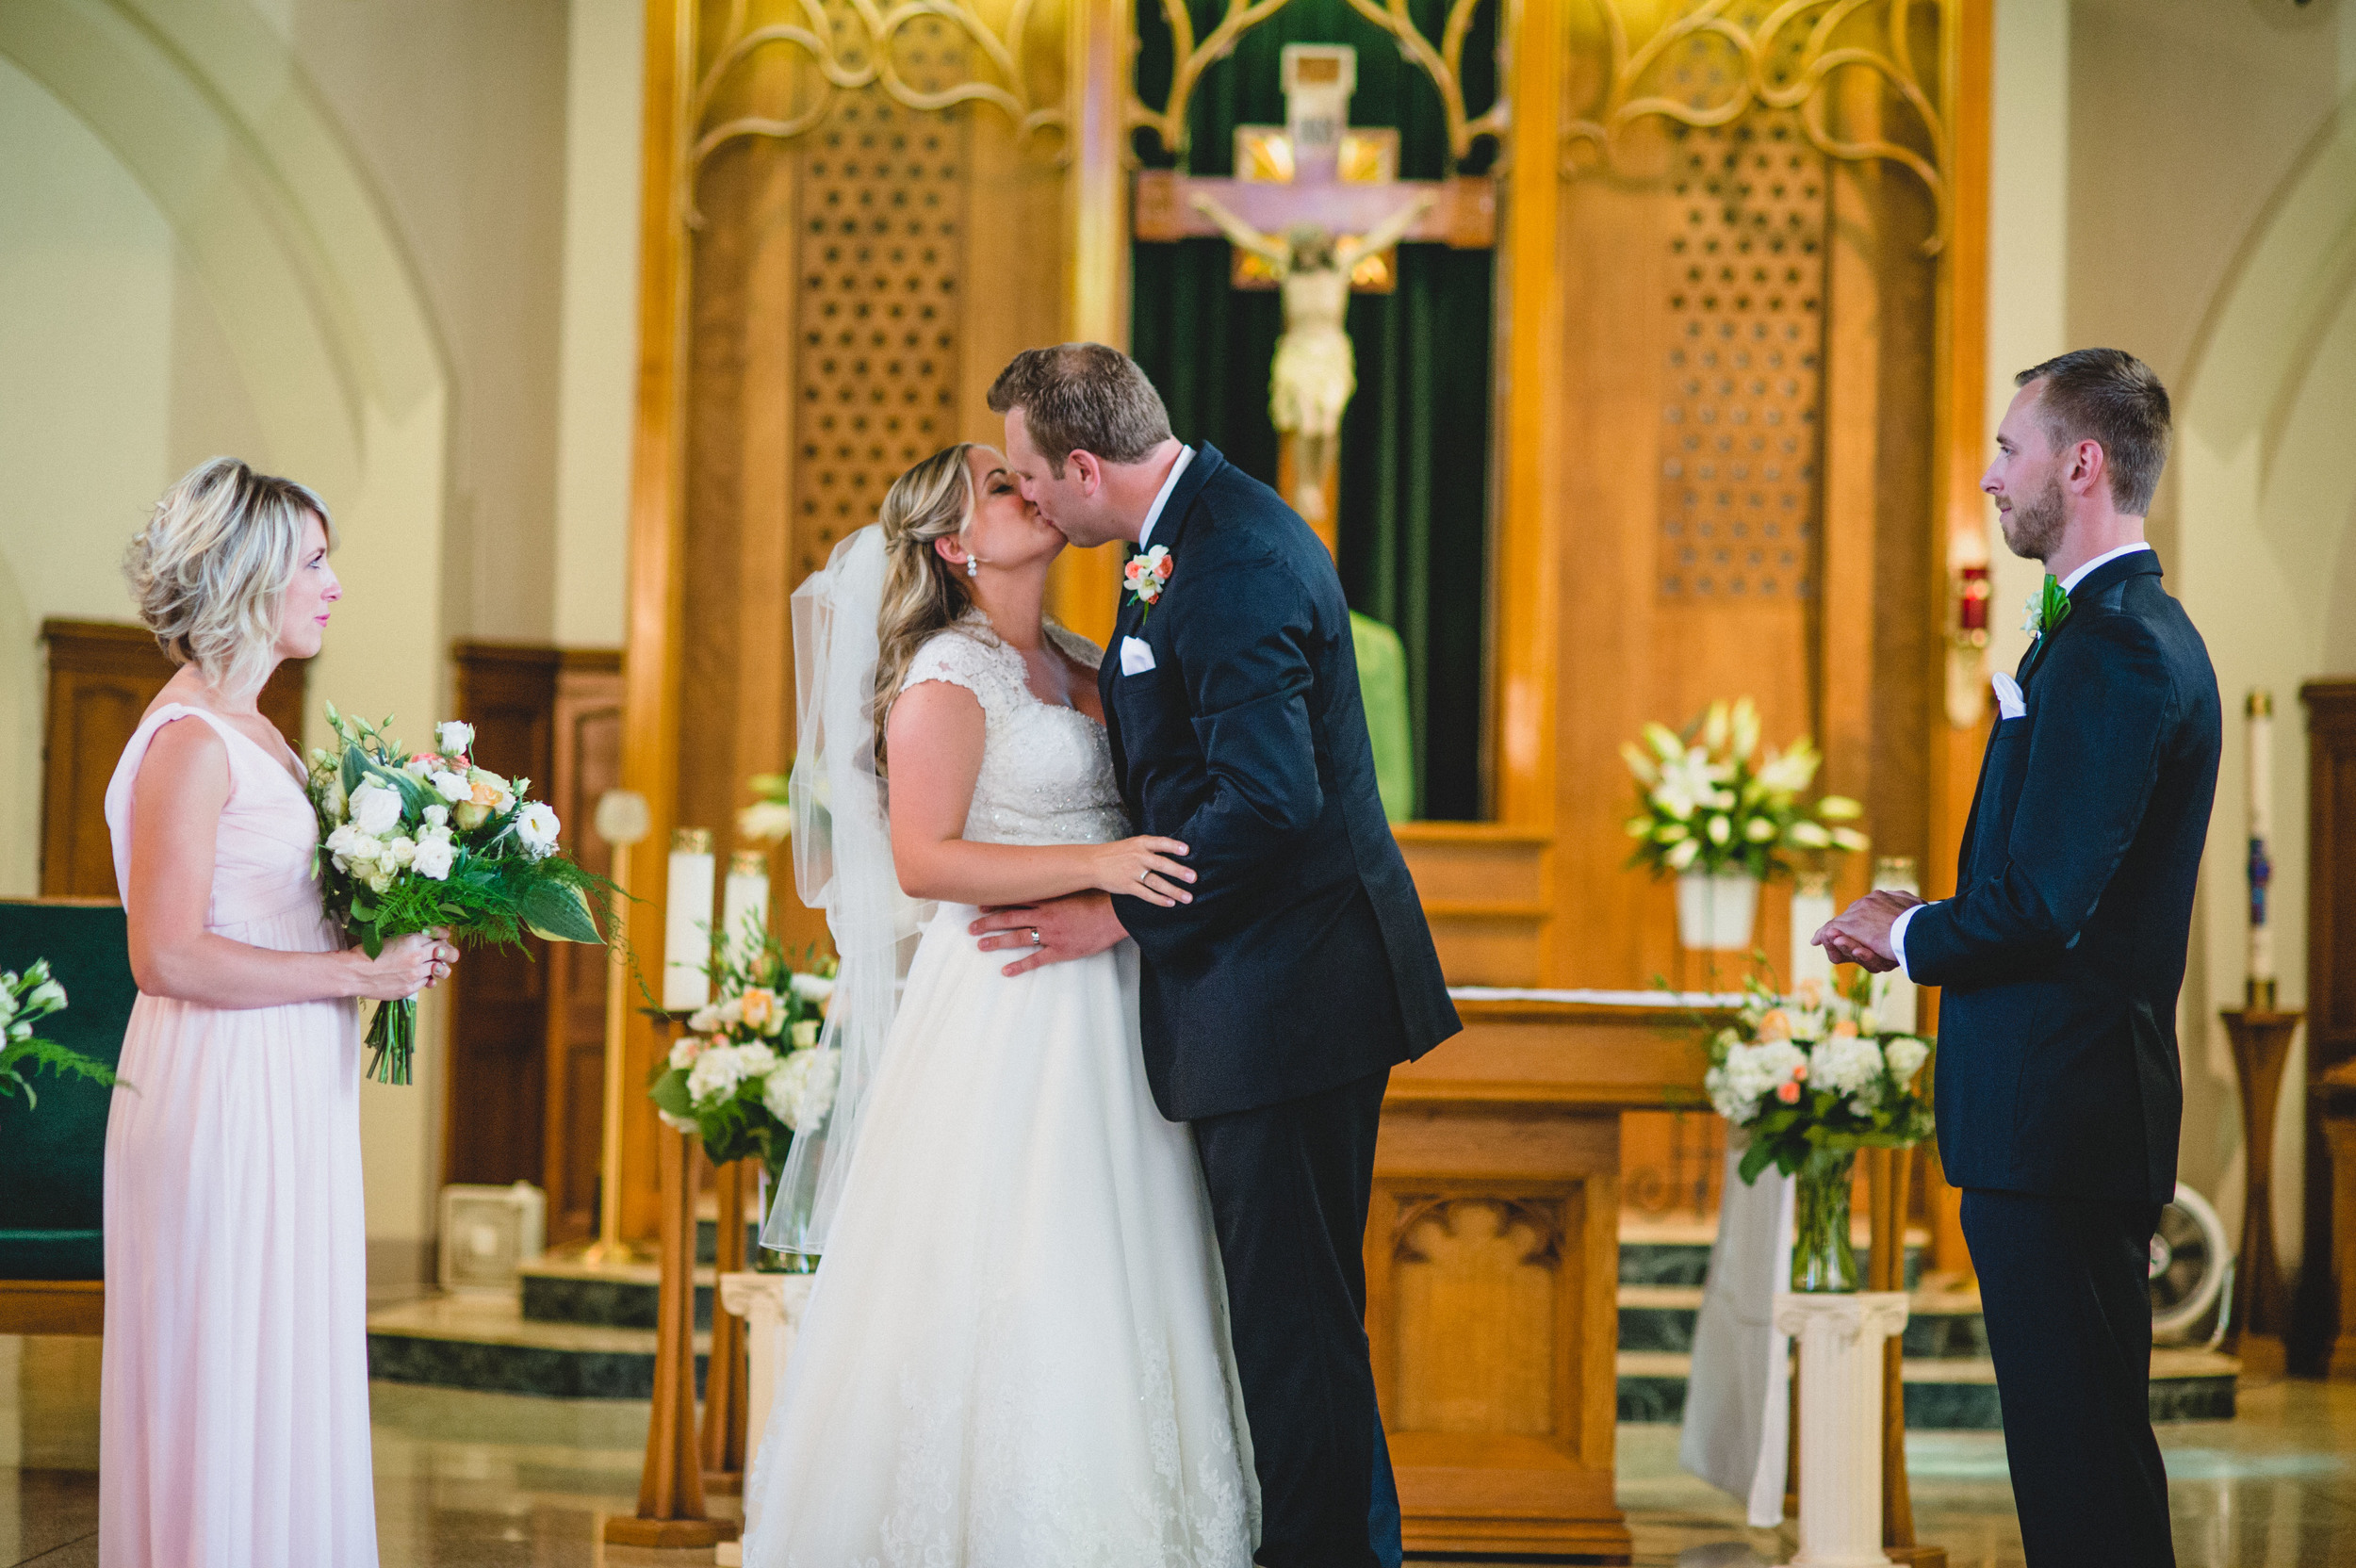 Vancouver St Augustine 's Church wedding photographer edward lai photography-48.jpg